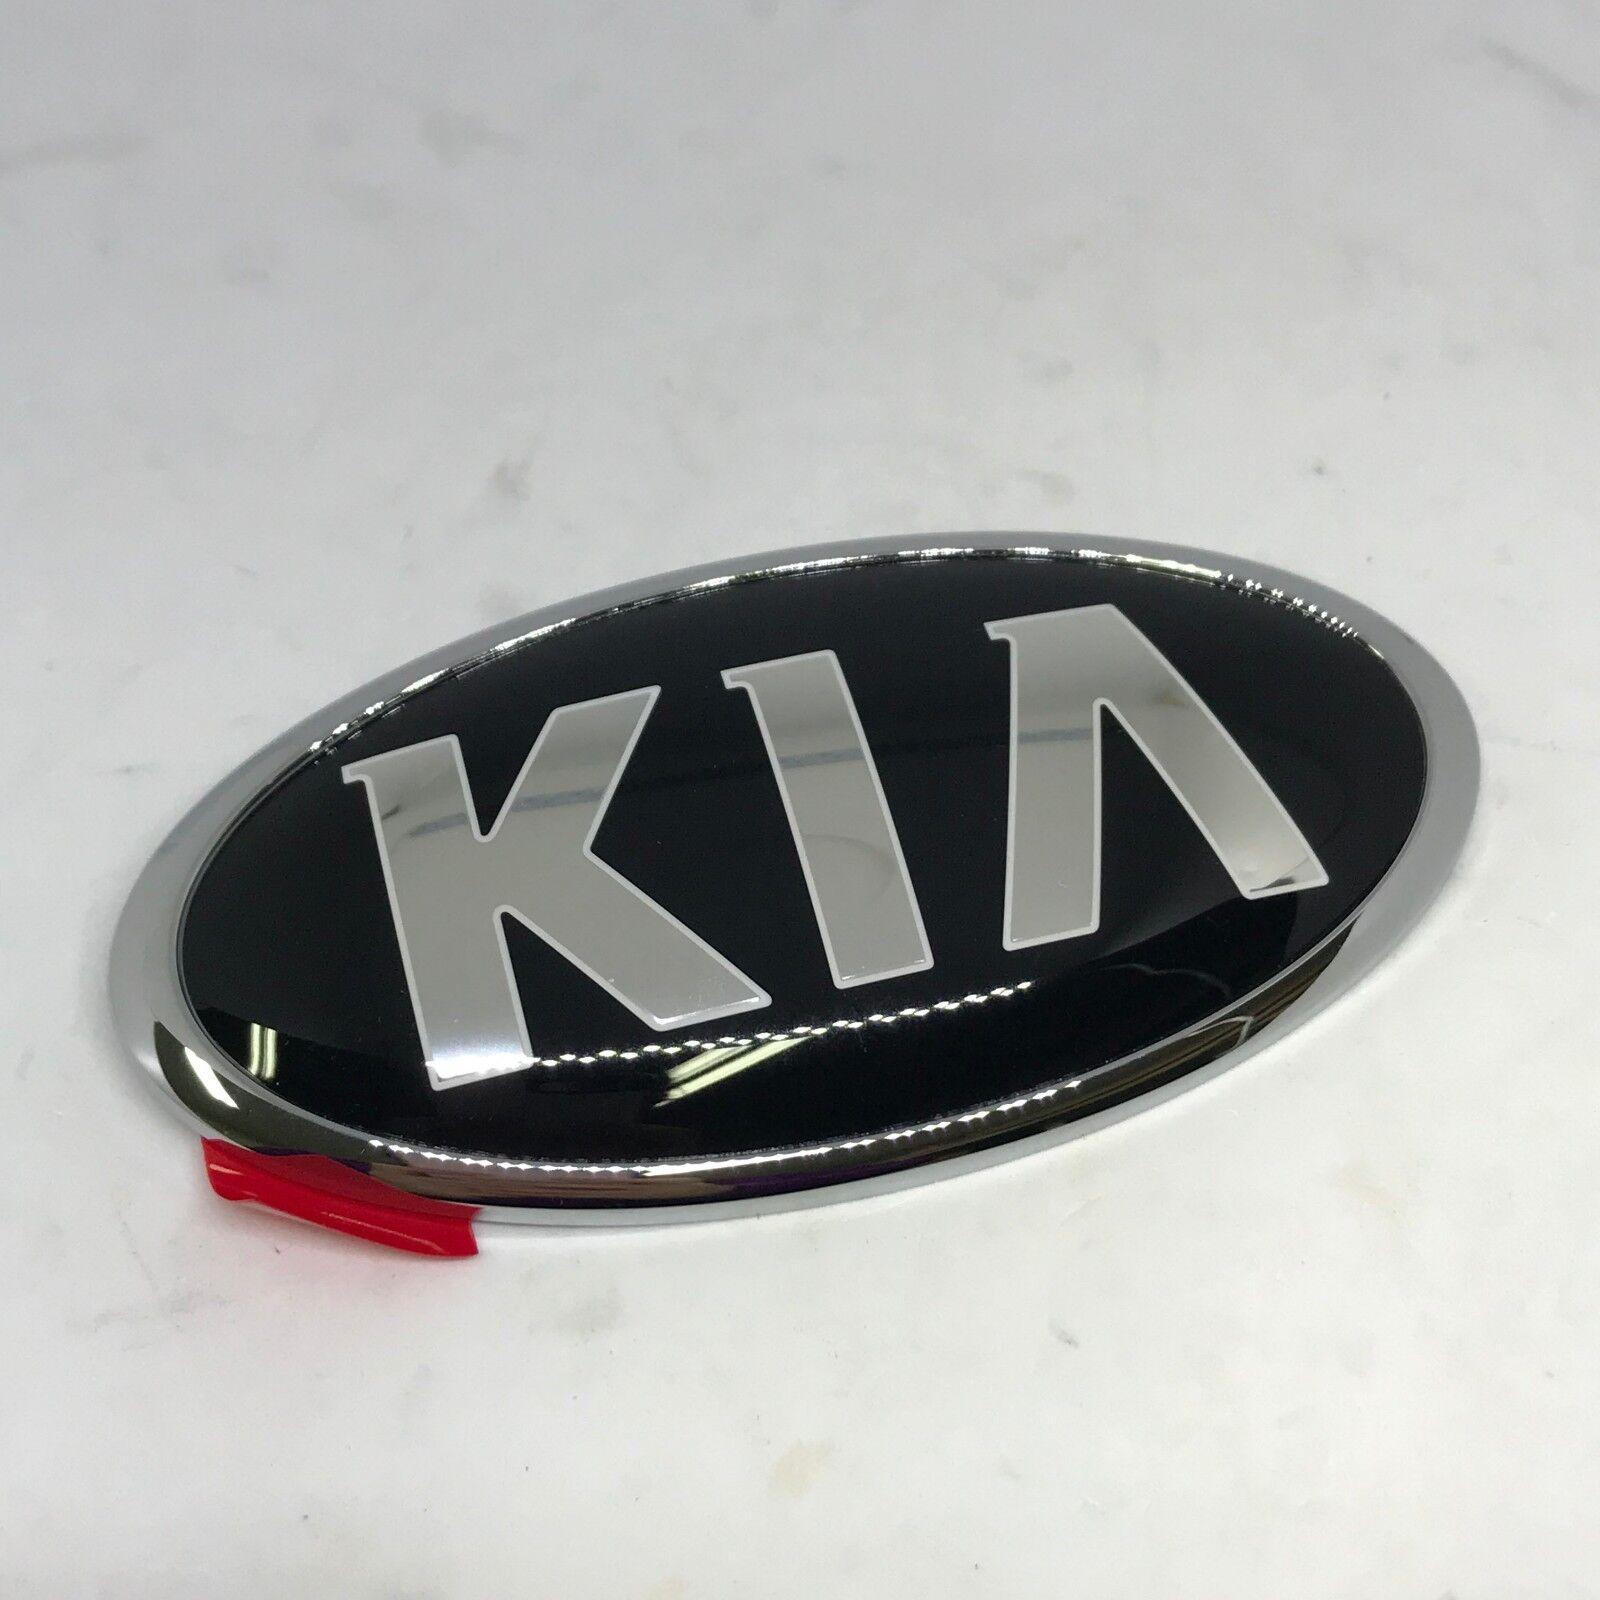 Rear KIA Logo Trunk Emblem 1Pcs Genuine 863182T000  For Kia Picanto 2011 2014